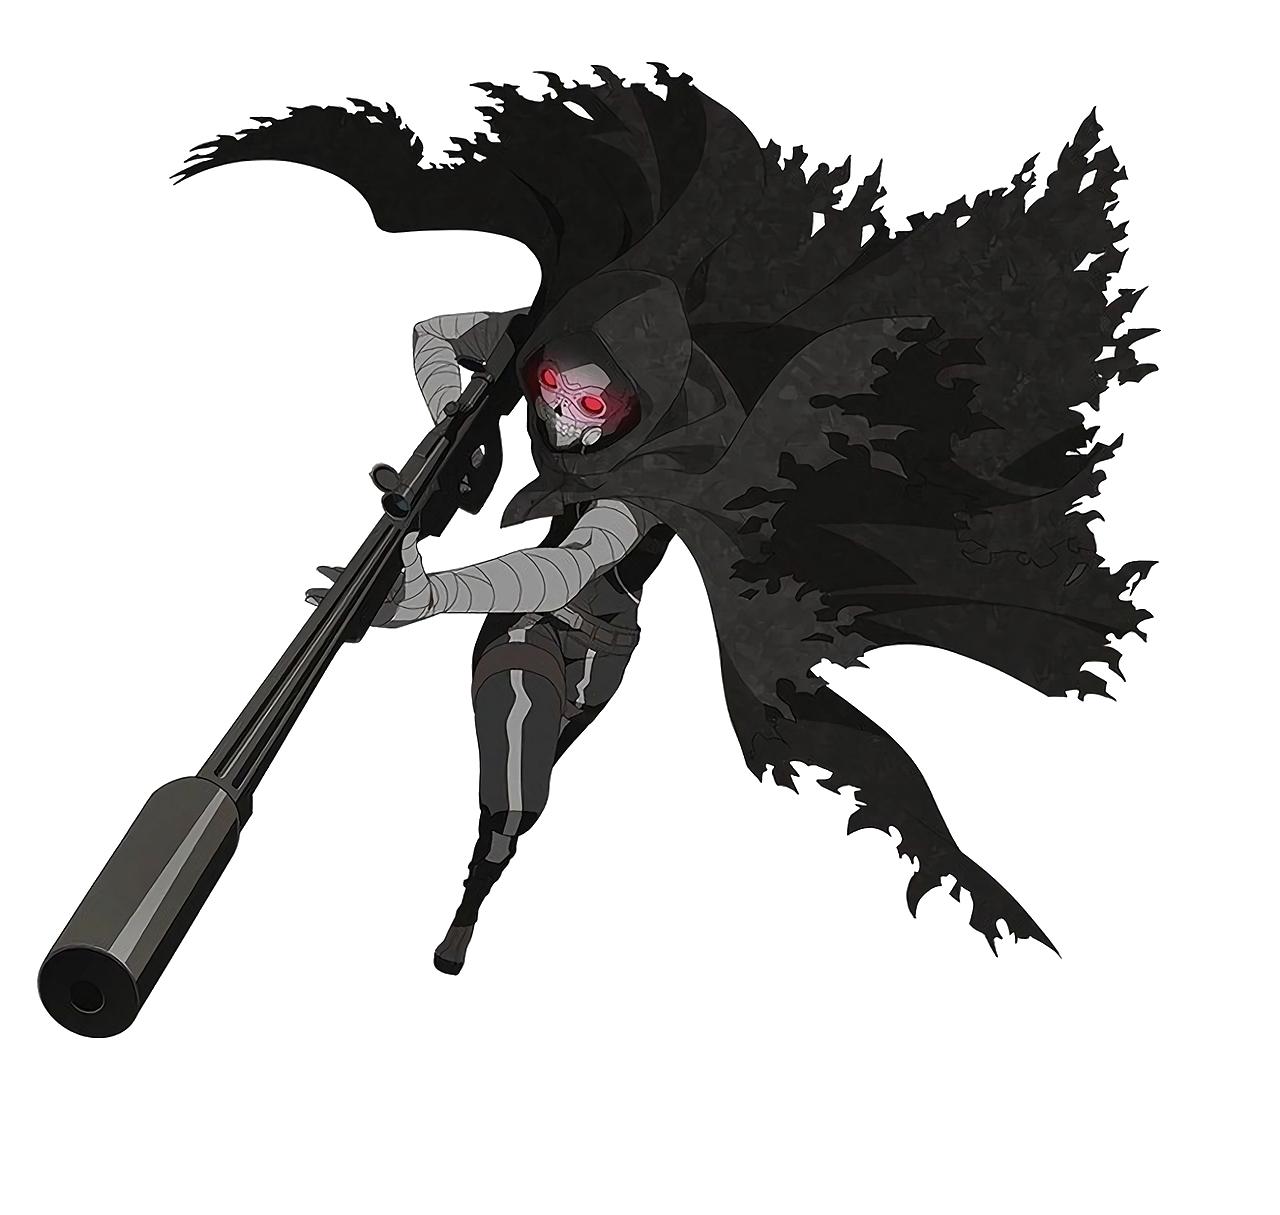 Image - Death Gun GGO2 copy.png   VS Battles Wiki   FANDOM ...